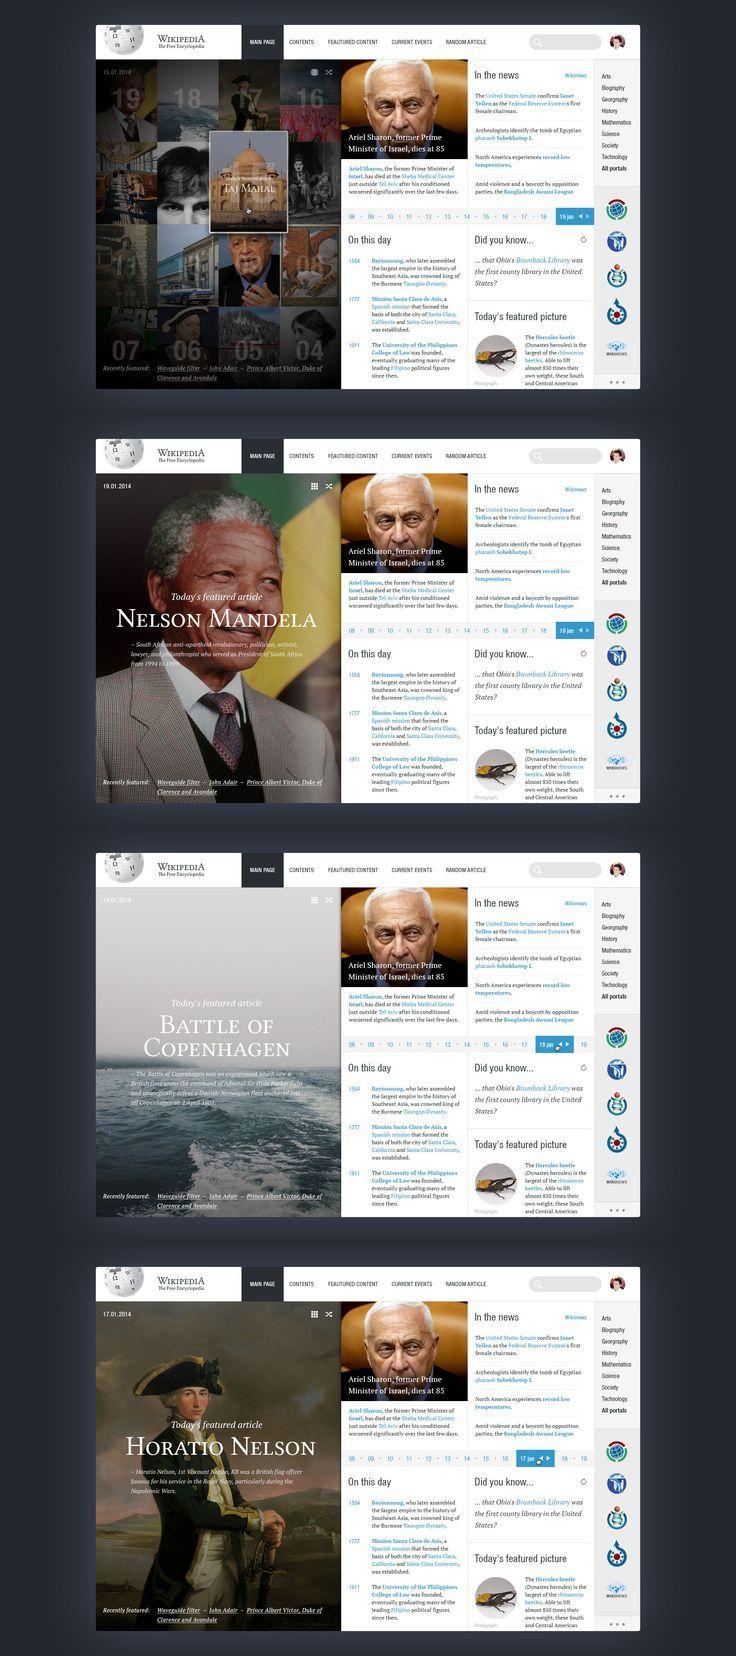 Wikipedia redesign by George Kvasnikov: